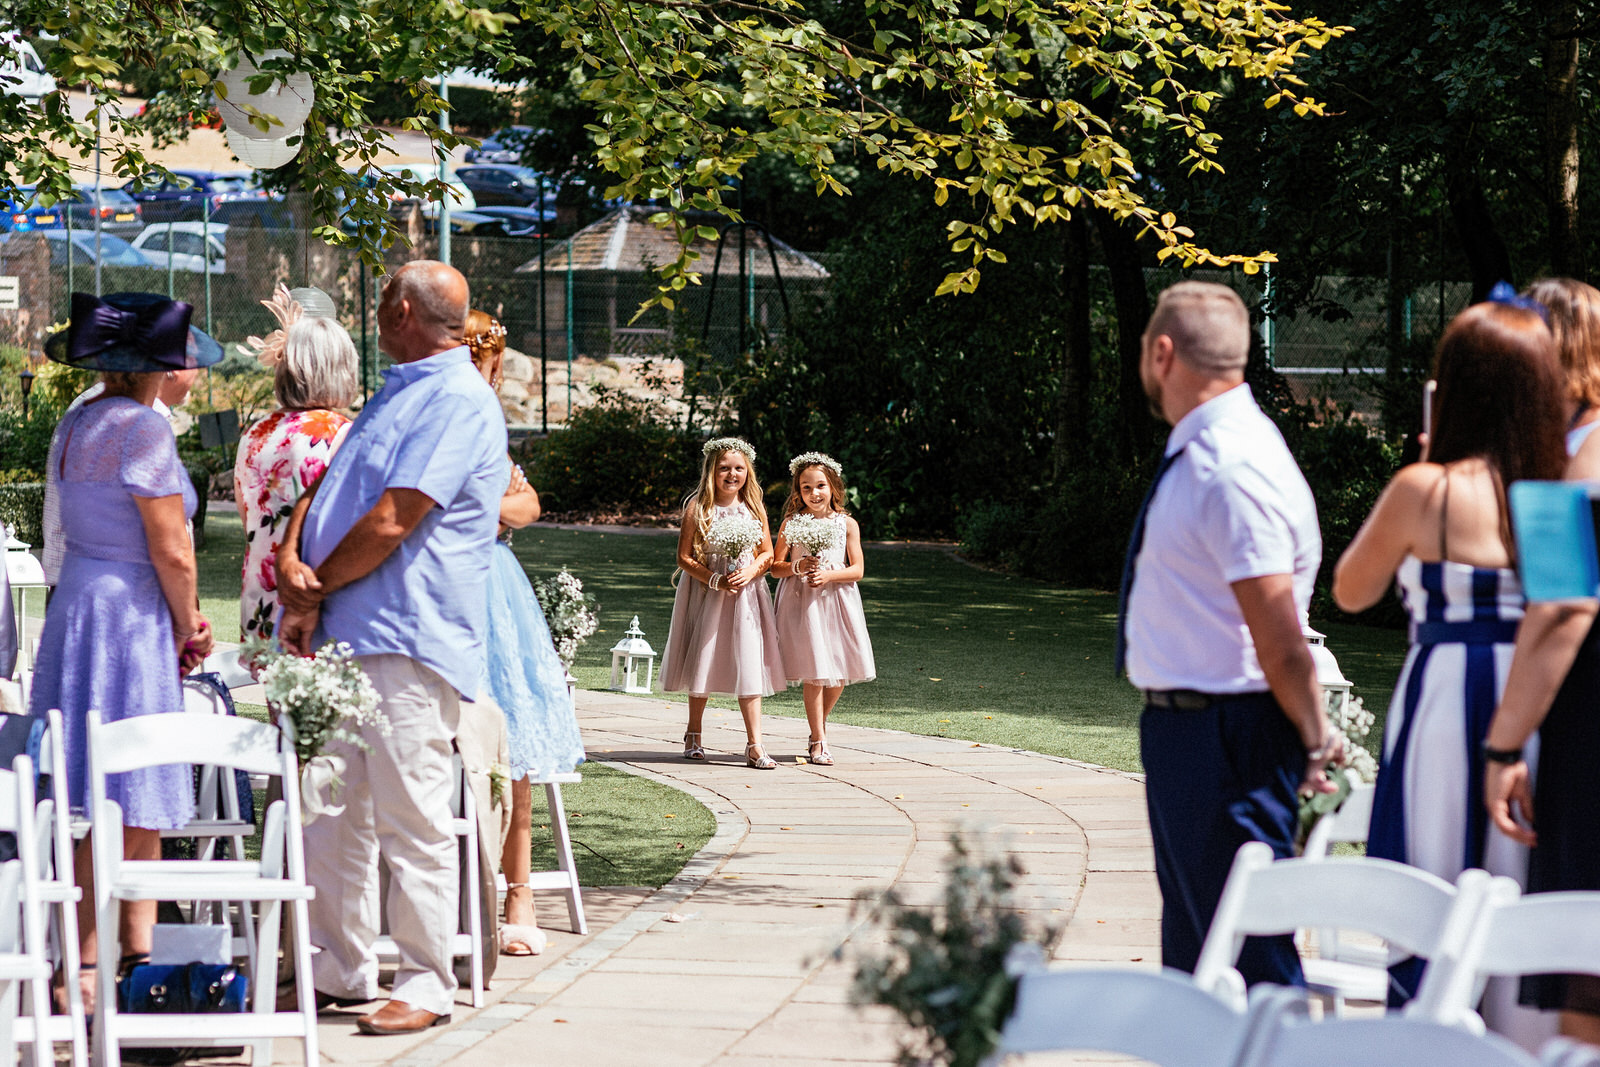 Moddershall-Oaks-Spa-Wedding-Photographer-016.jpg